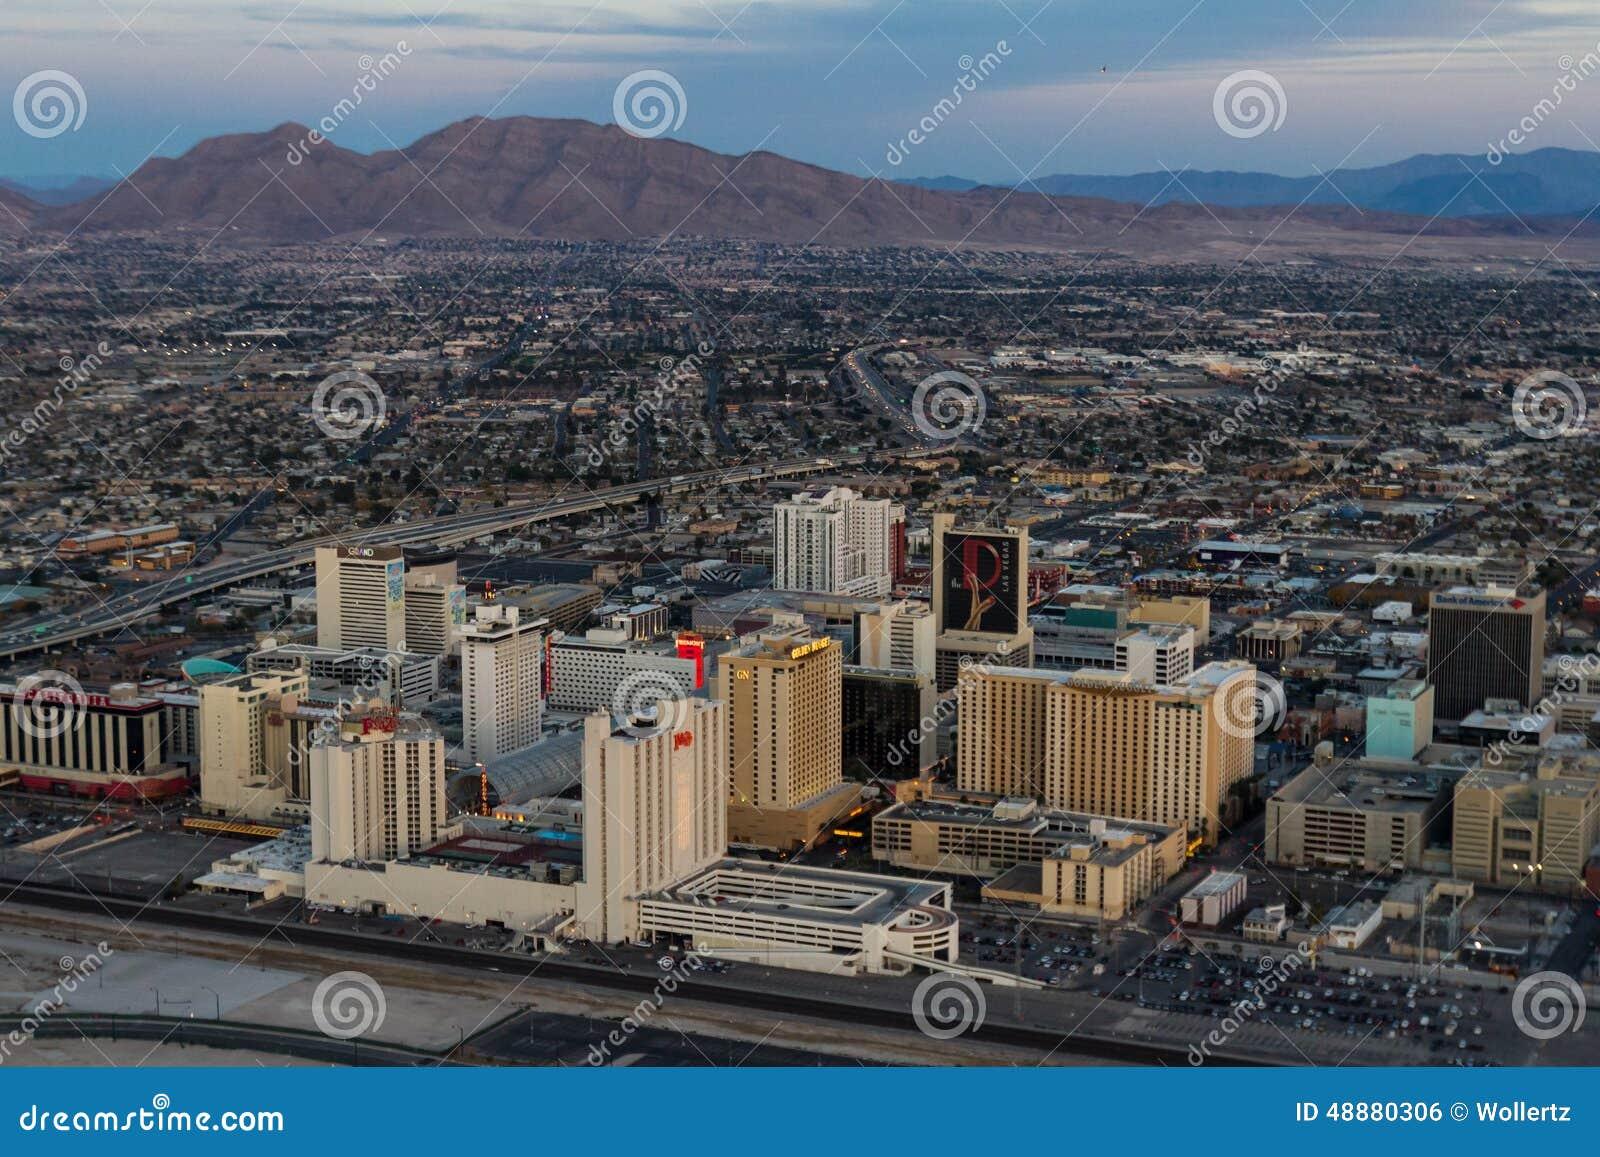 Hotels In North Las Vegas Nv